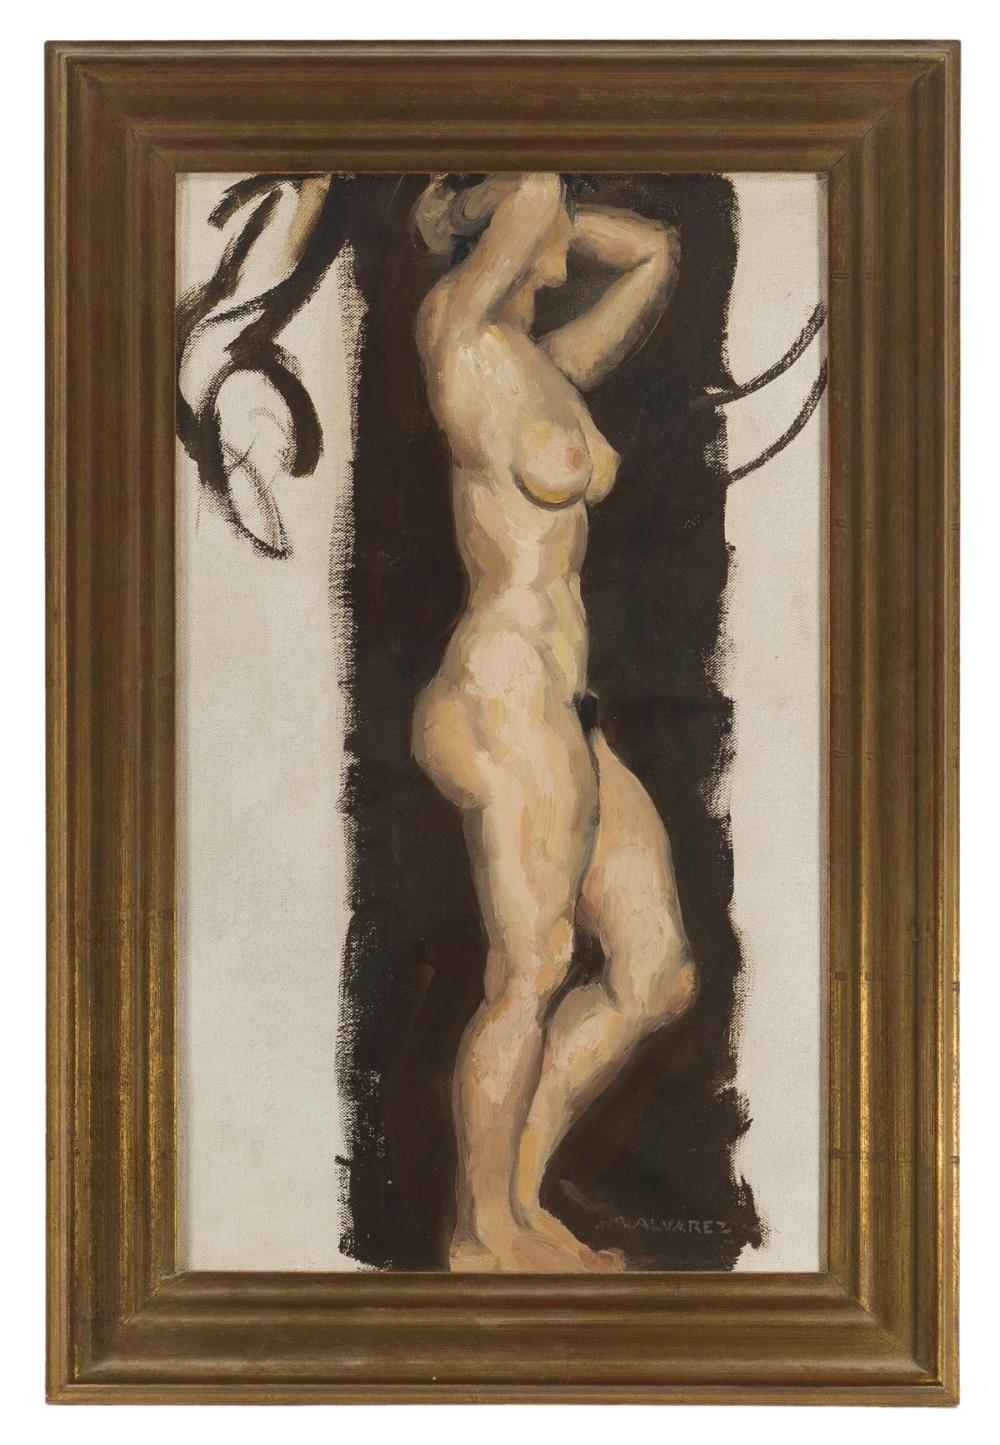 Mabel Alvarez, (1891-1985 Los Angeles, CA), Study of a nude, Oil on canvas, 18